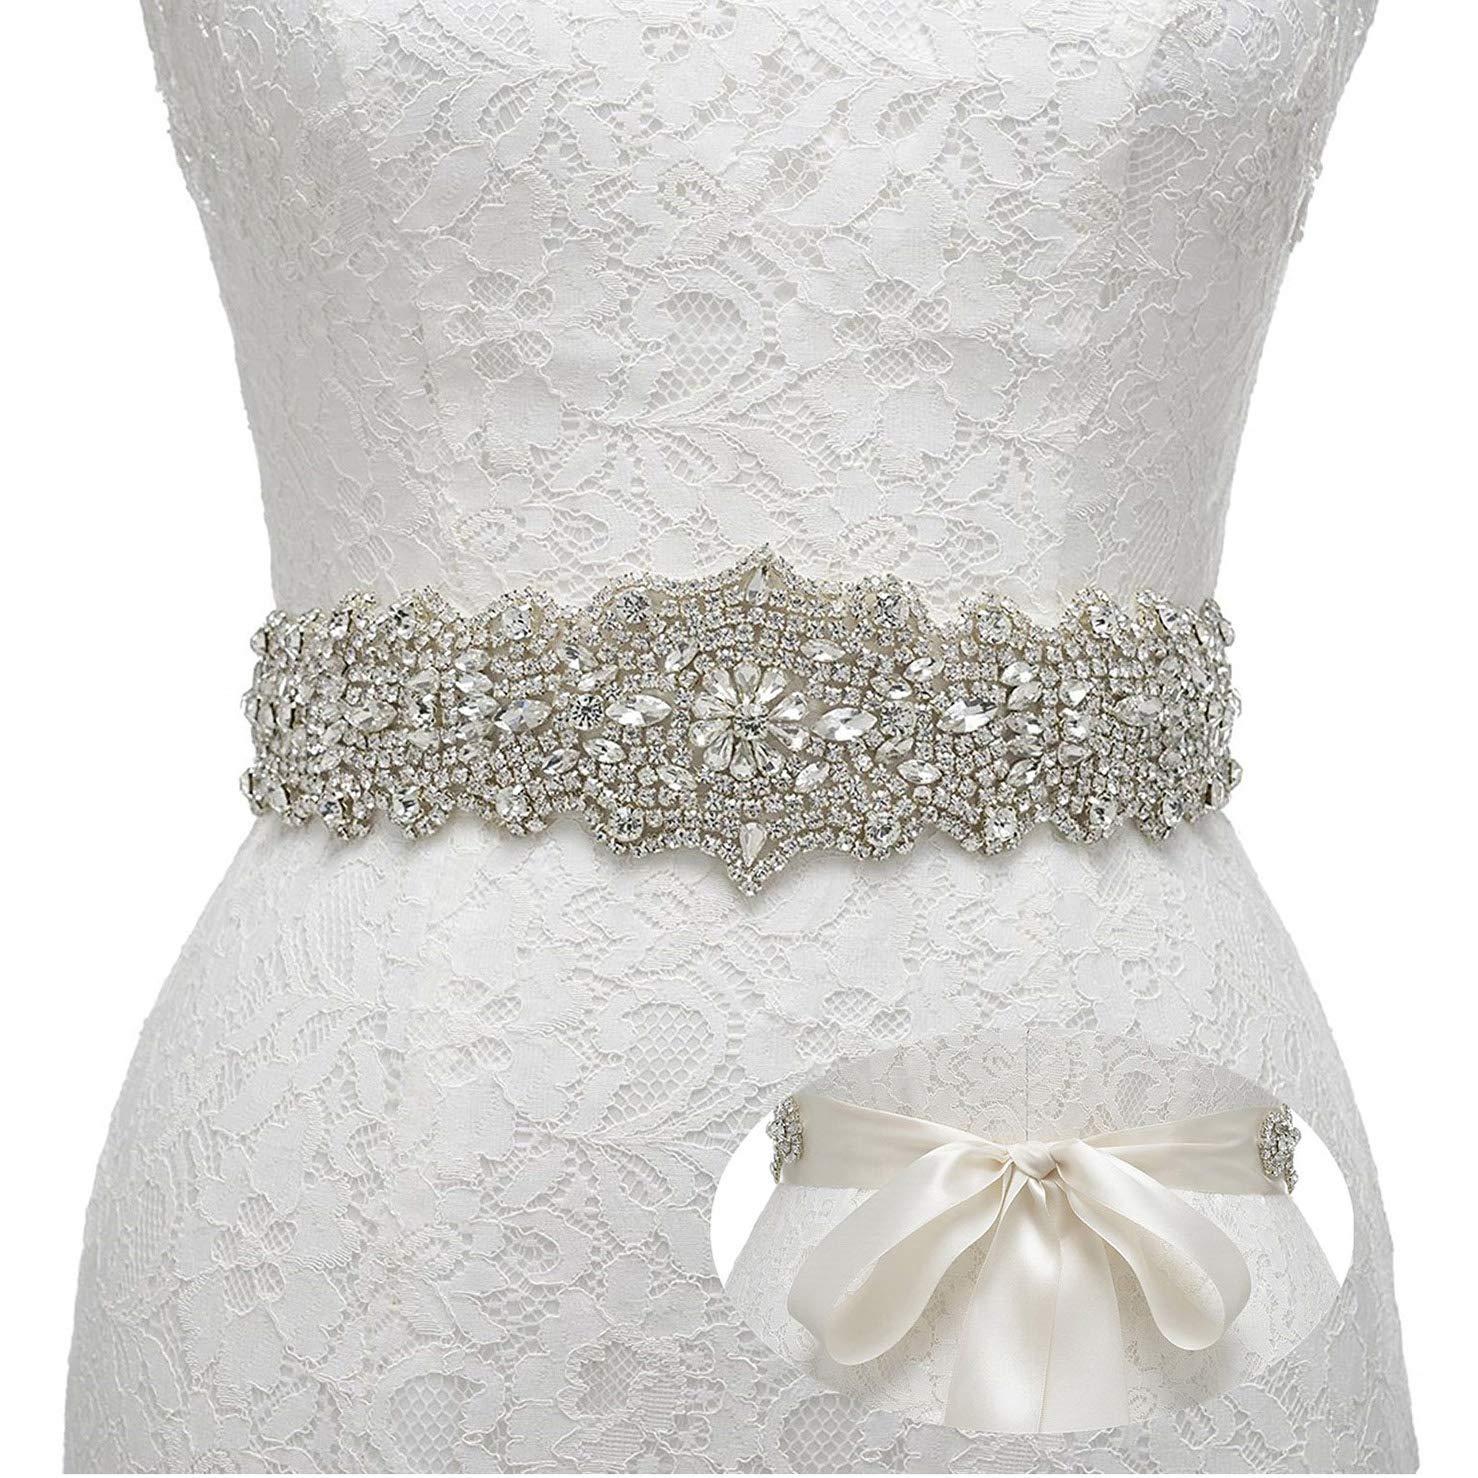 Remedios Rhinestone Bridal Belt Crystal Wedding Belt Bridesmaid Sash Women Dress Accessories, Ivory